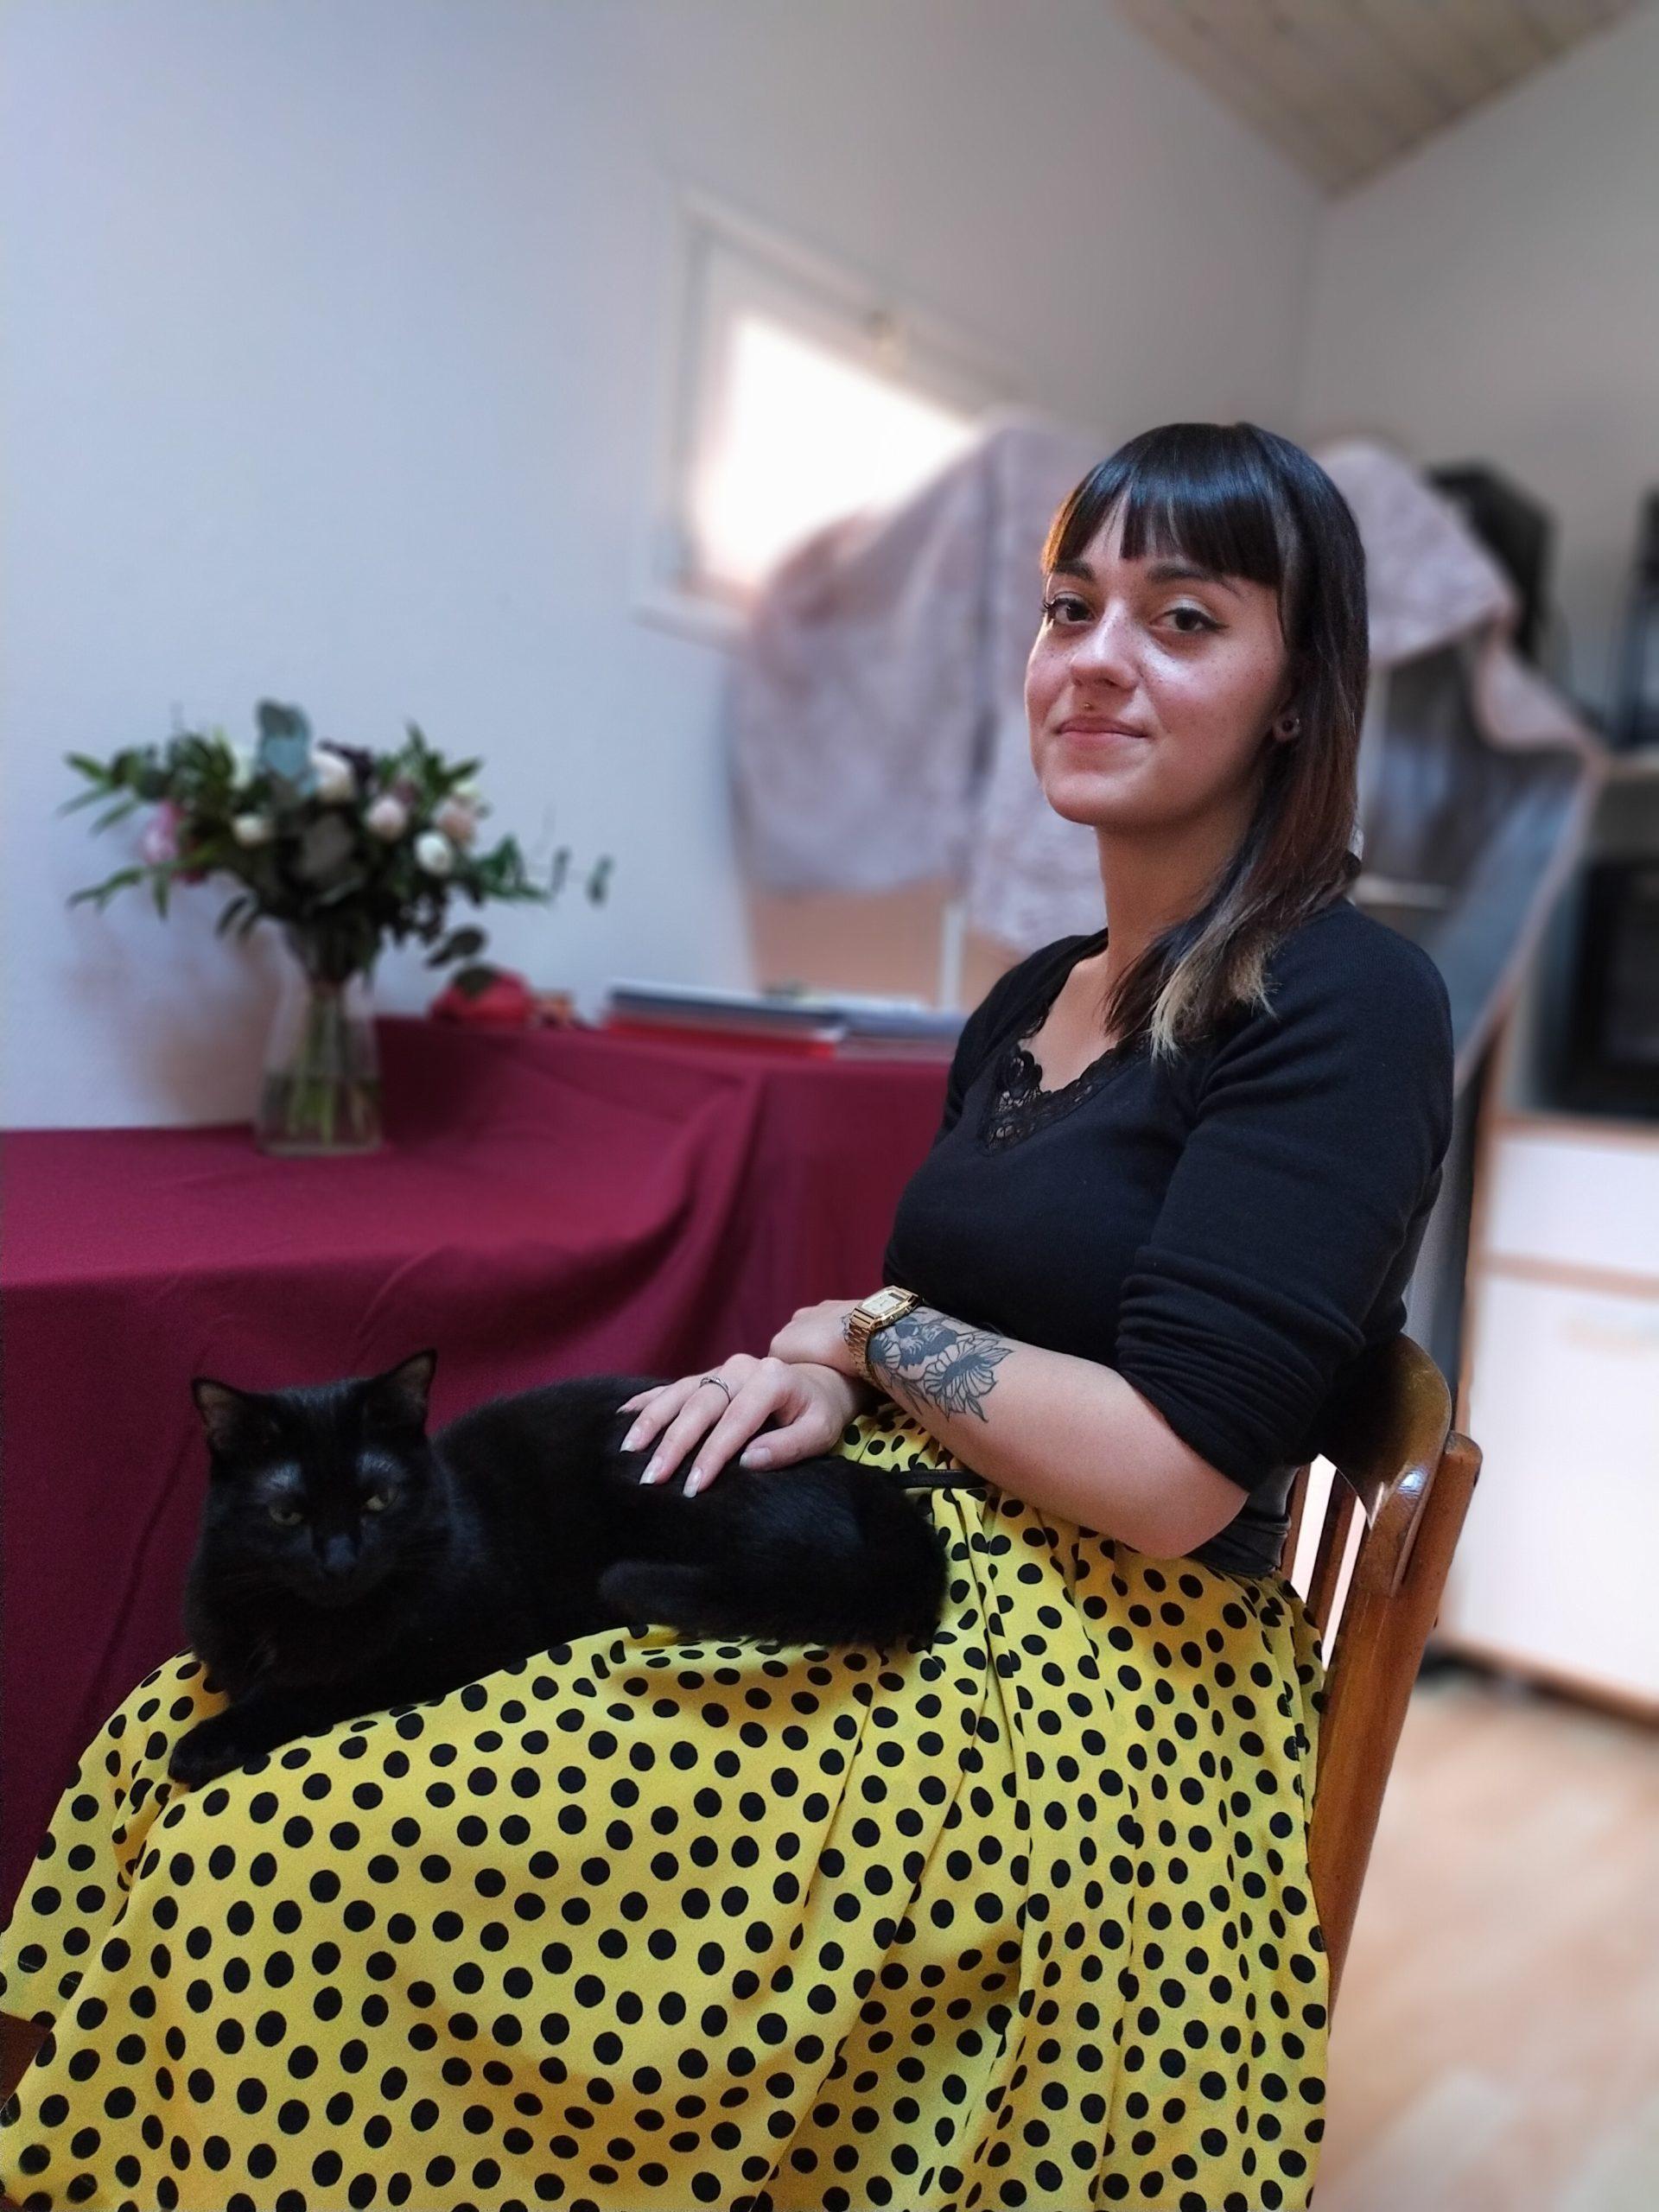 Zoé Bodet et sa chatte Naïade. Crédits : Manon Pitaud